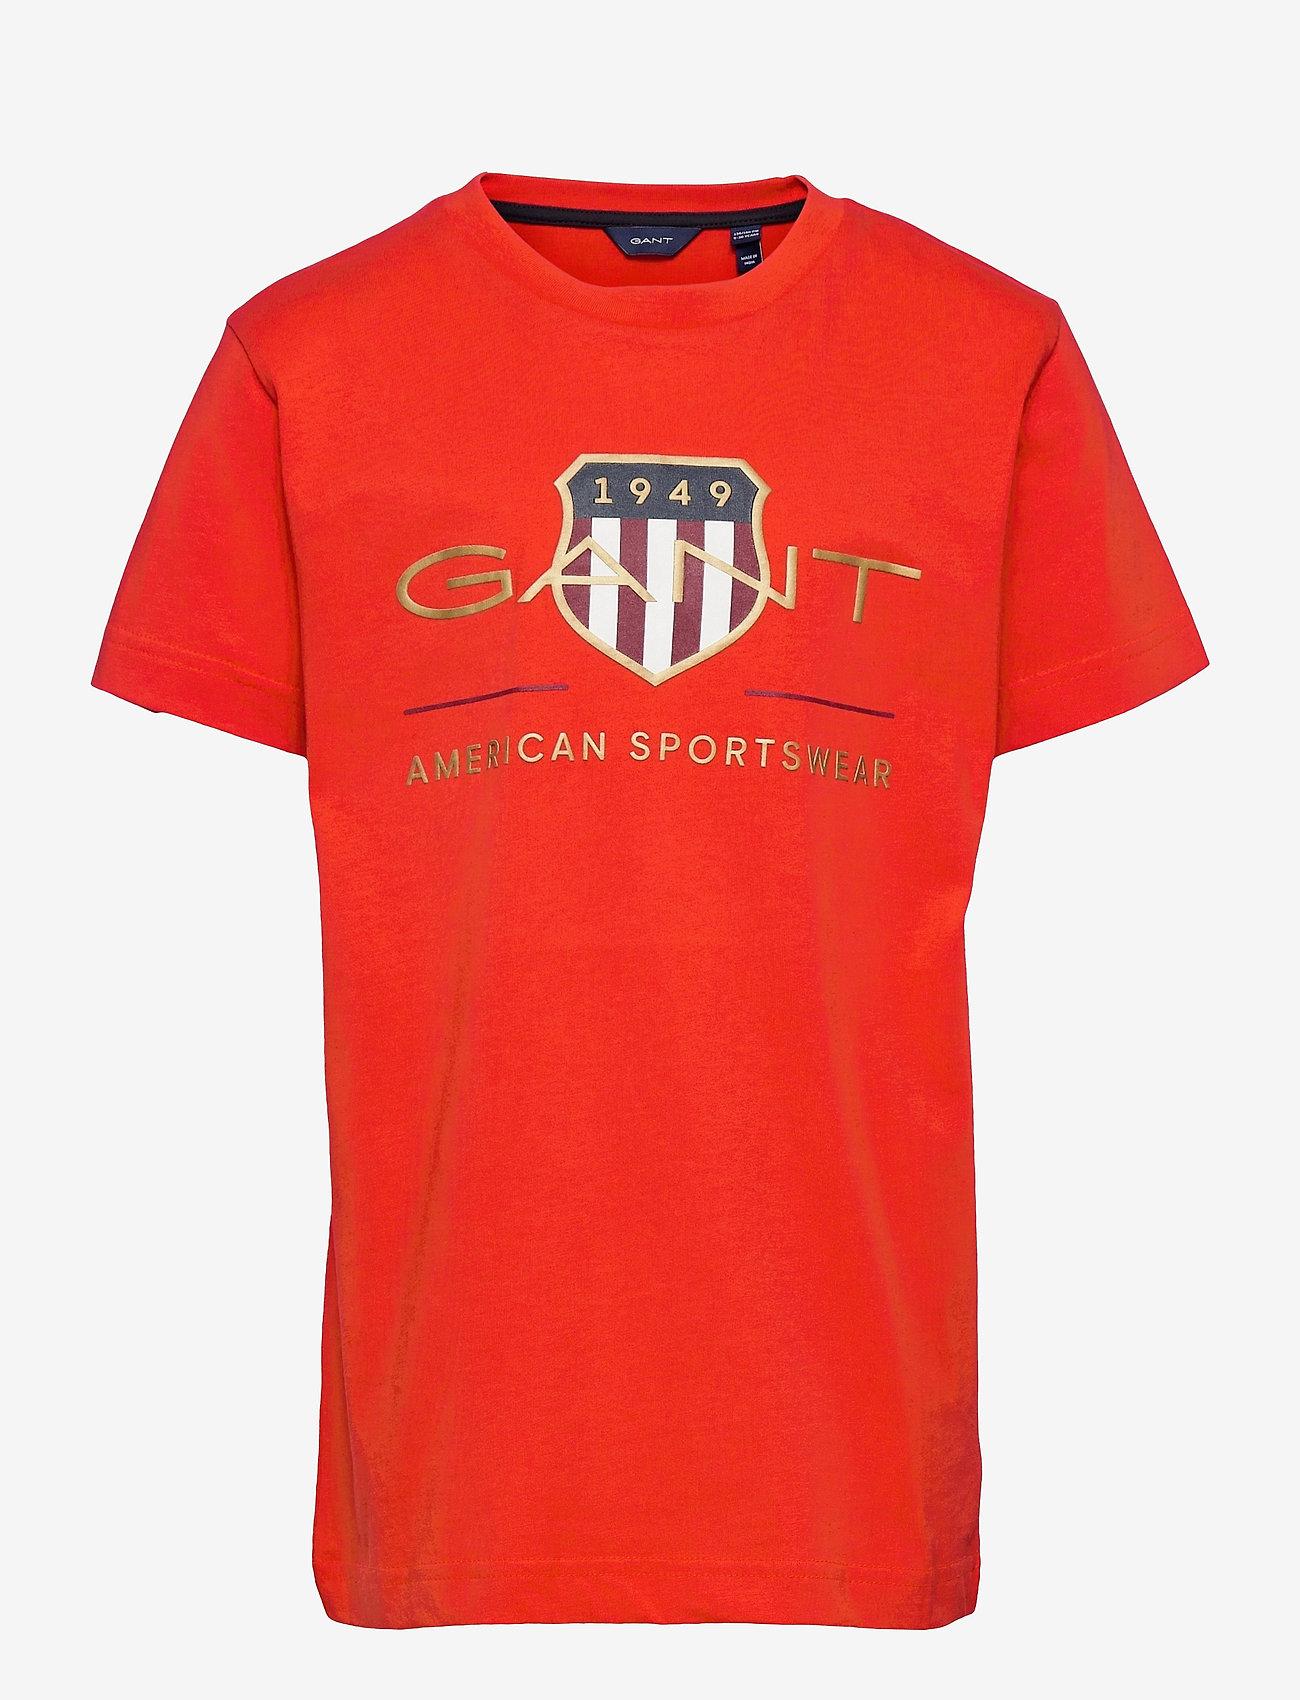 GANT - ARCHIVE SHIELD SS T-SHIRT - short-sleeved - lava red - 0